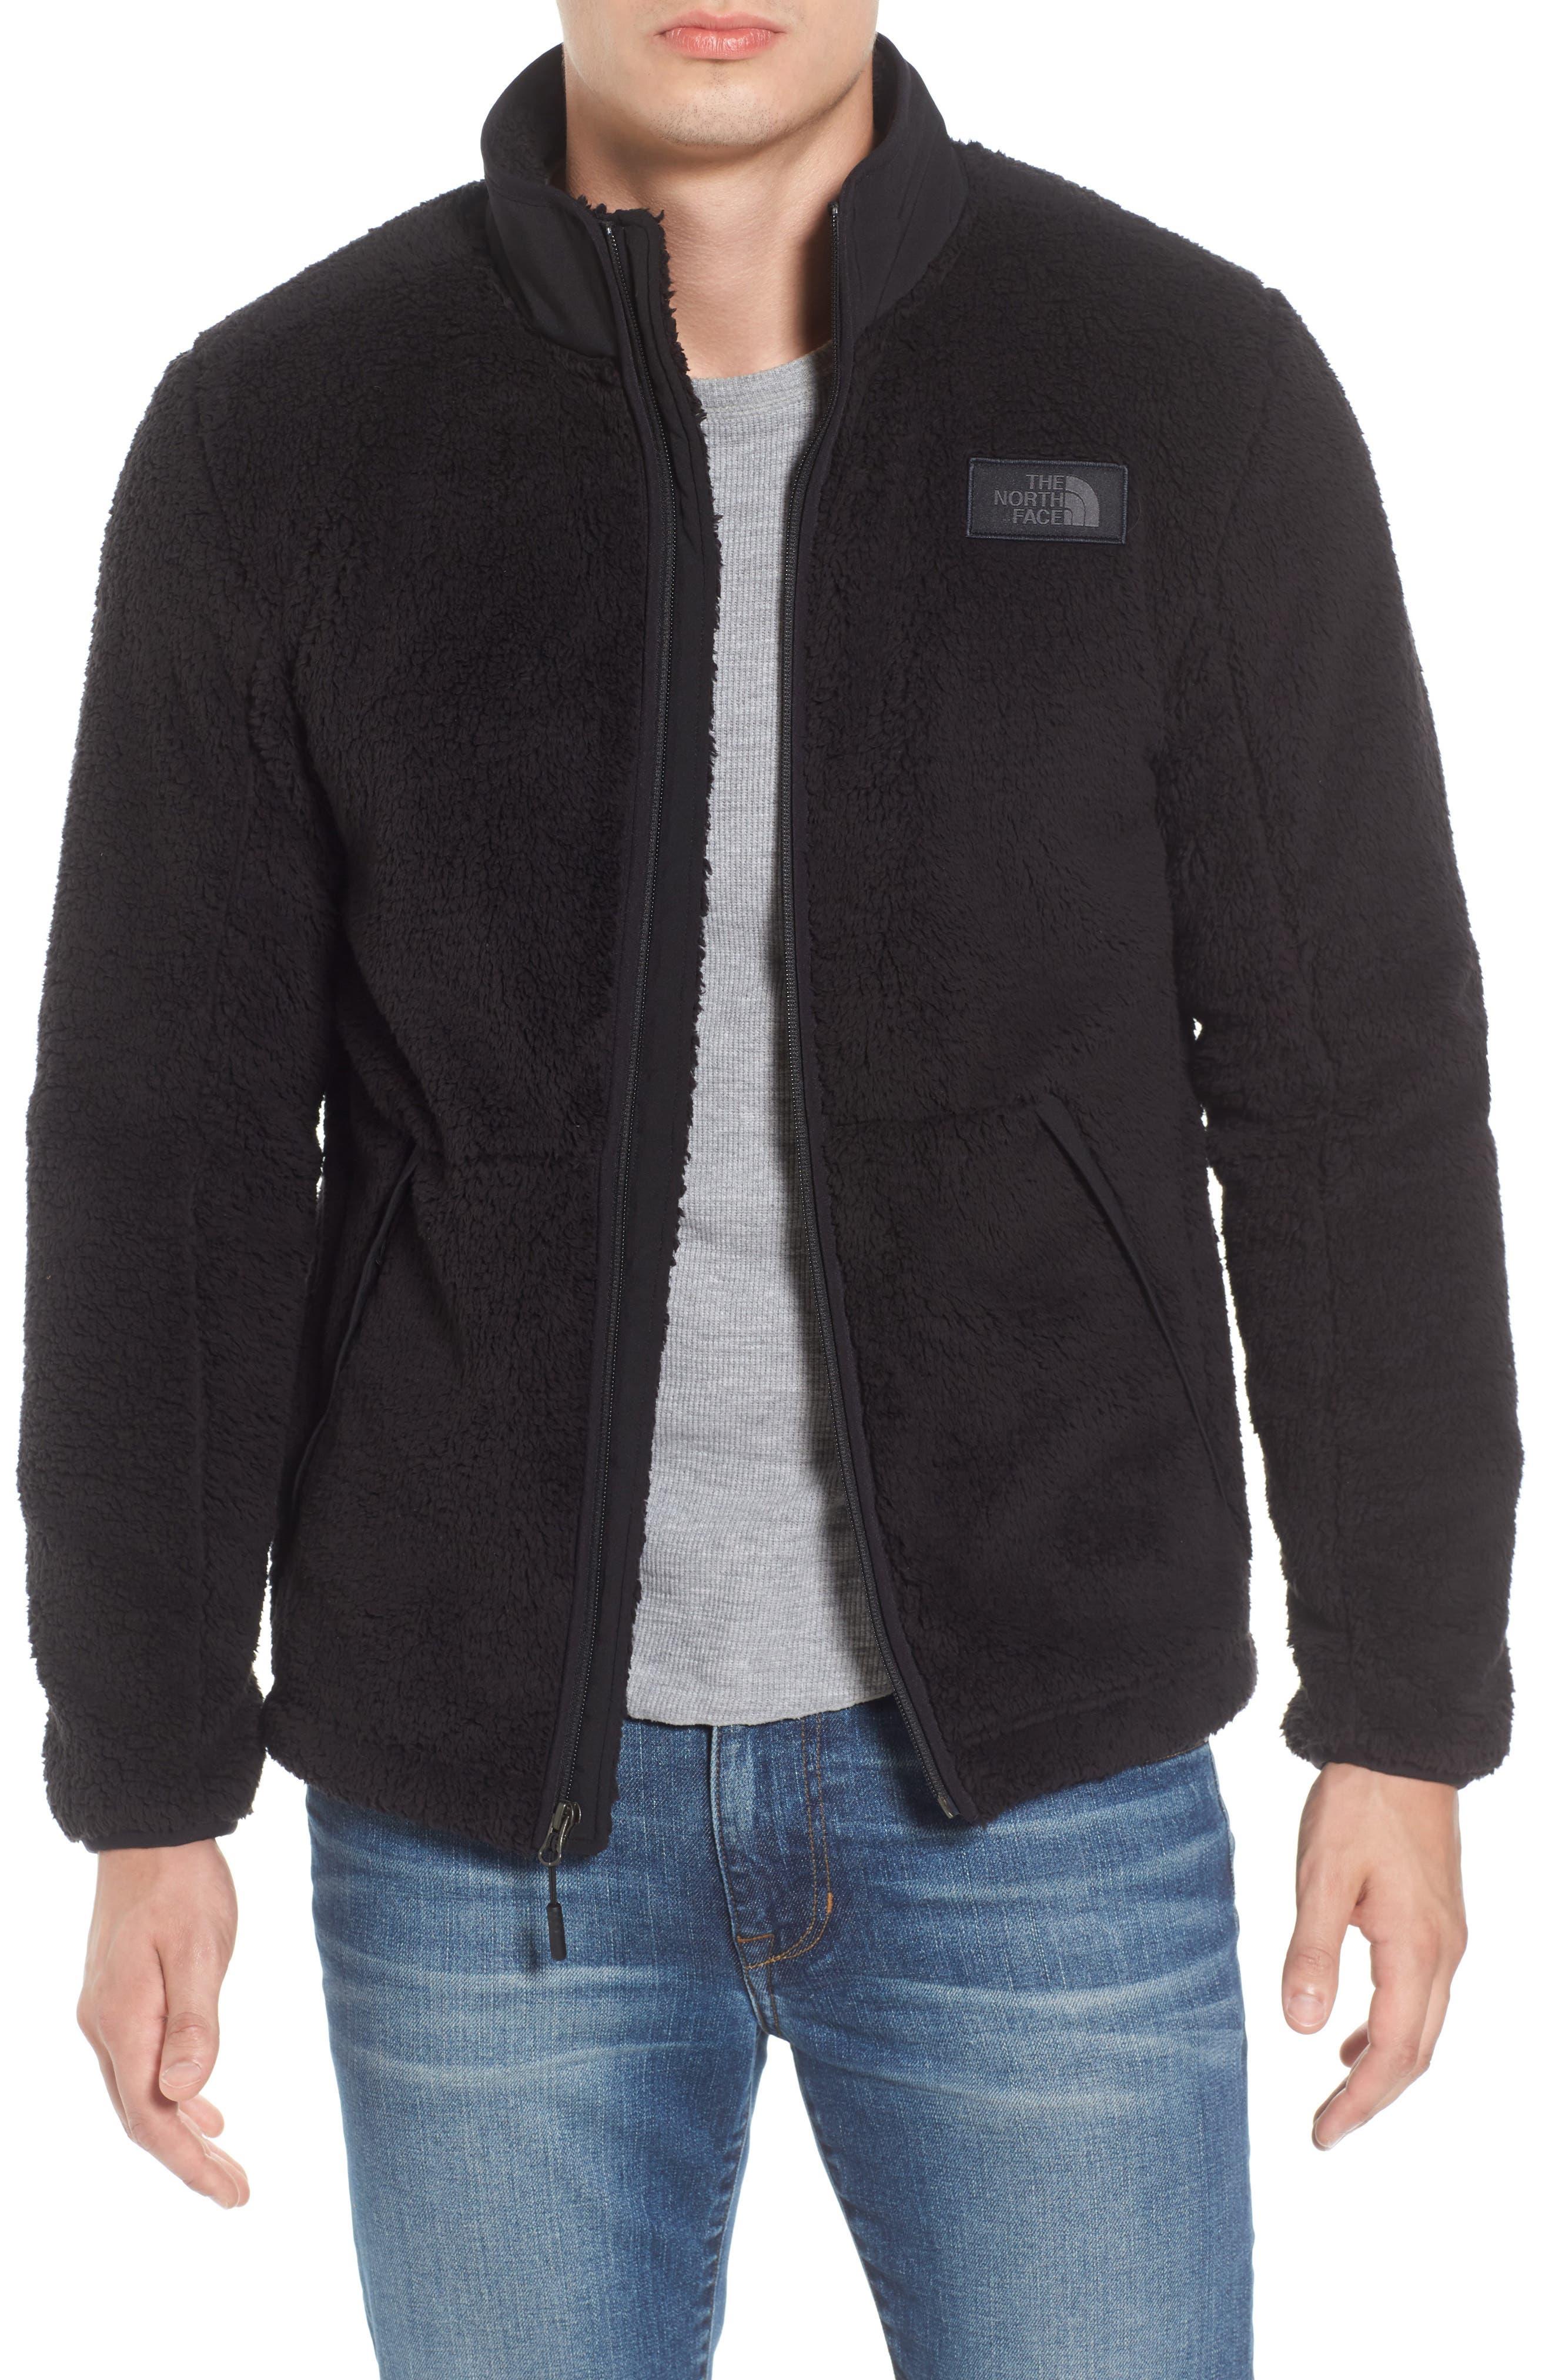 THE NORTH FACE Campshire Zip Fleece Jacket, Main, color, 001